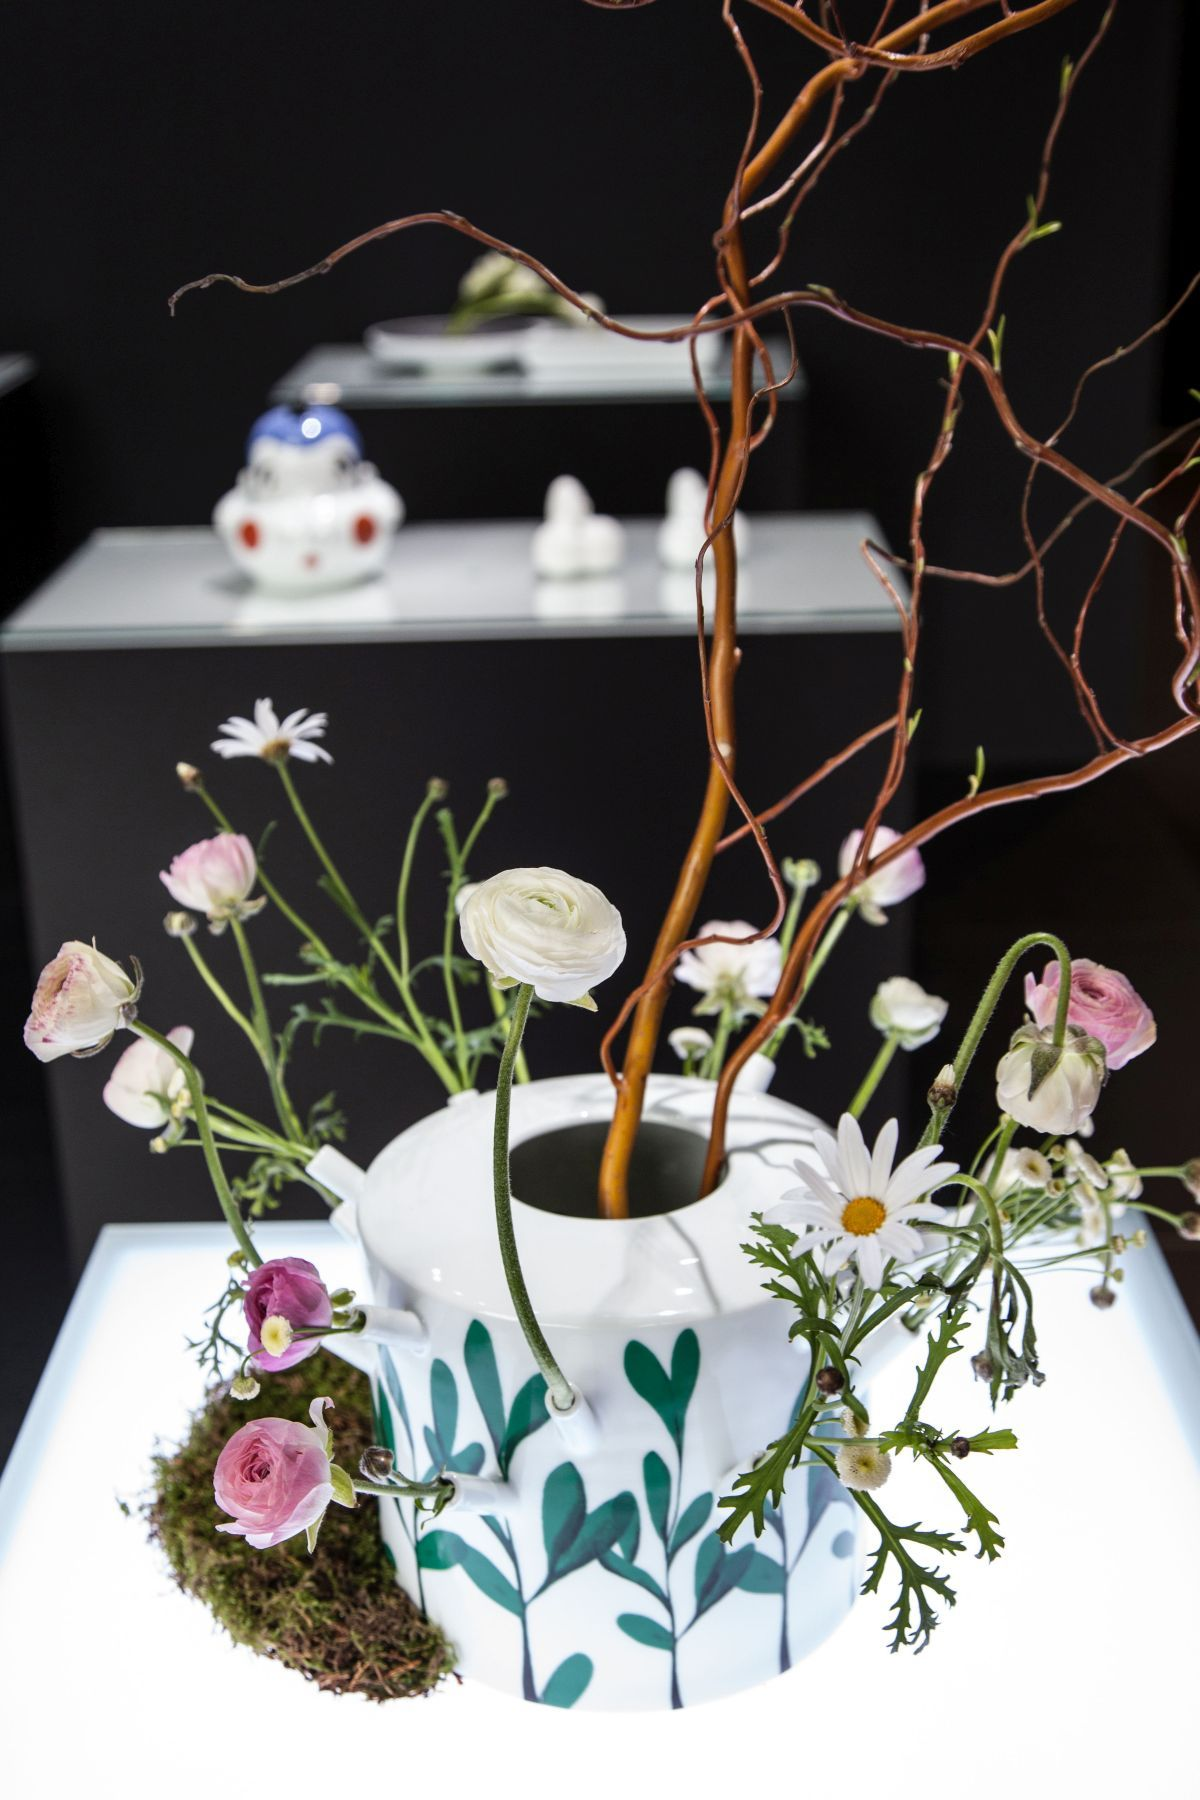 ARITA-400project-Porcelain-flower-vase